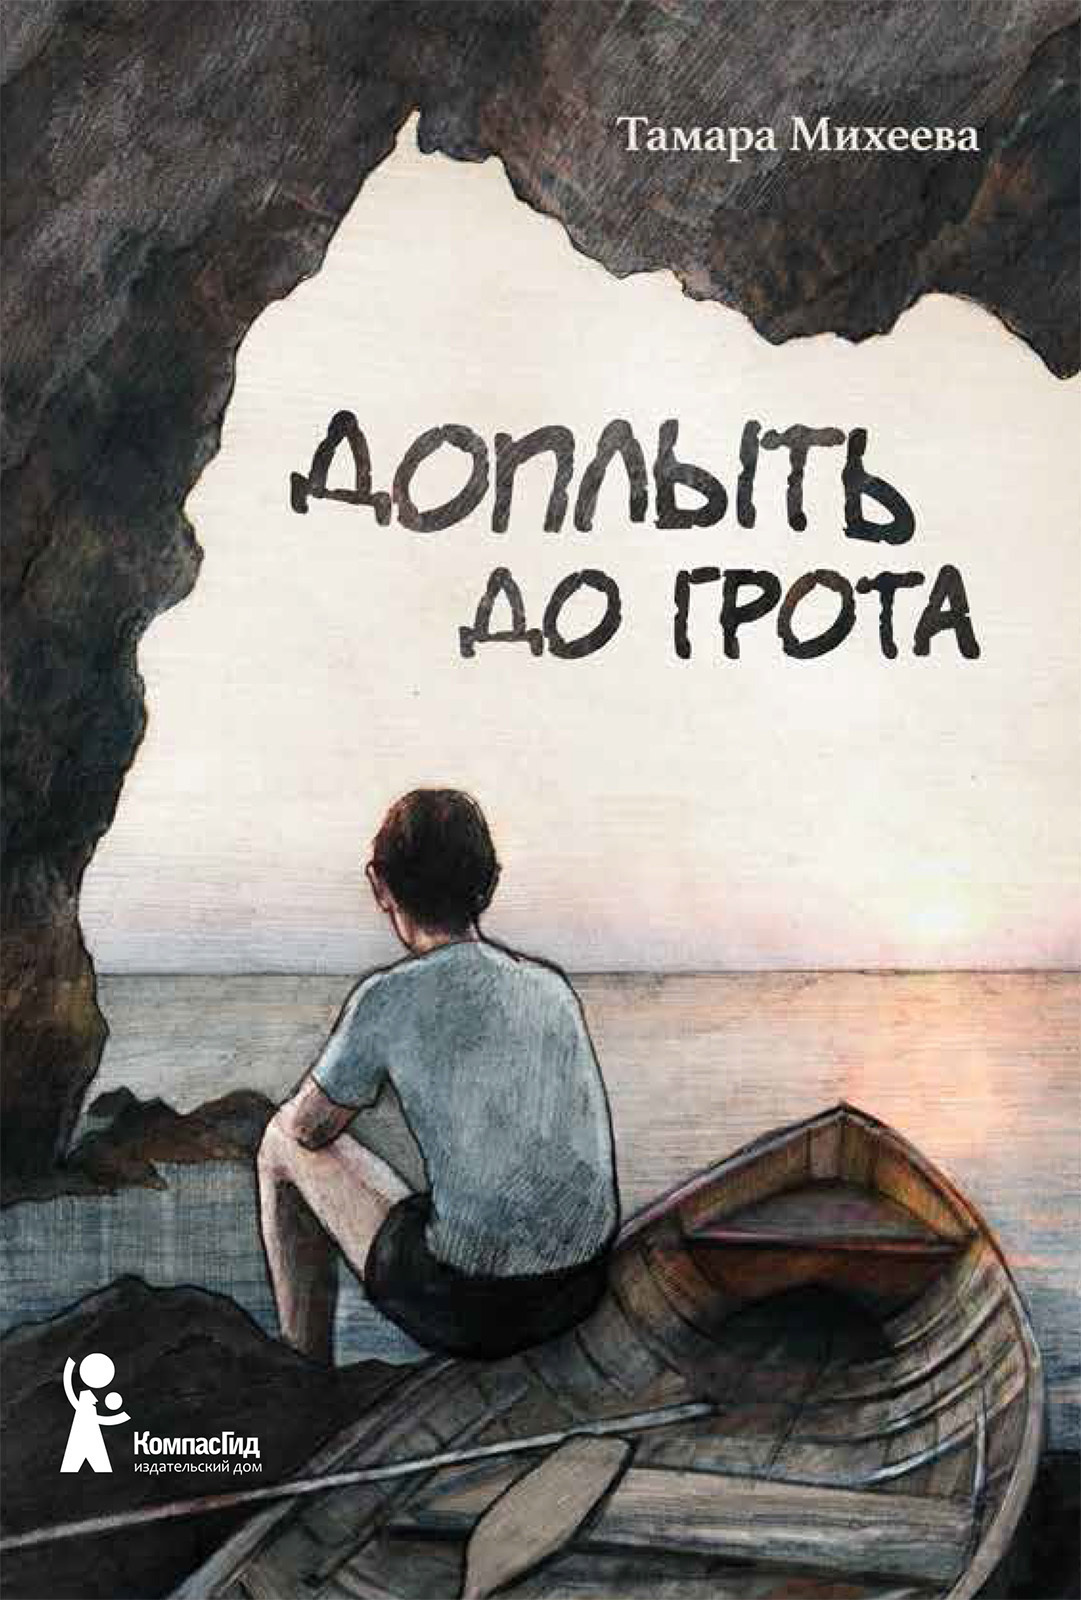 Тамара Михеева - Доплыть до грота (сборник)